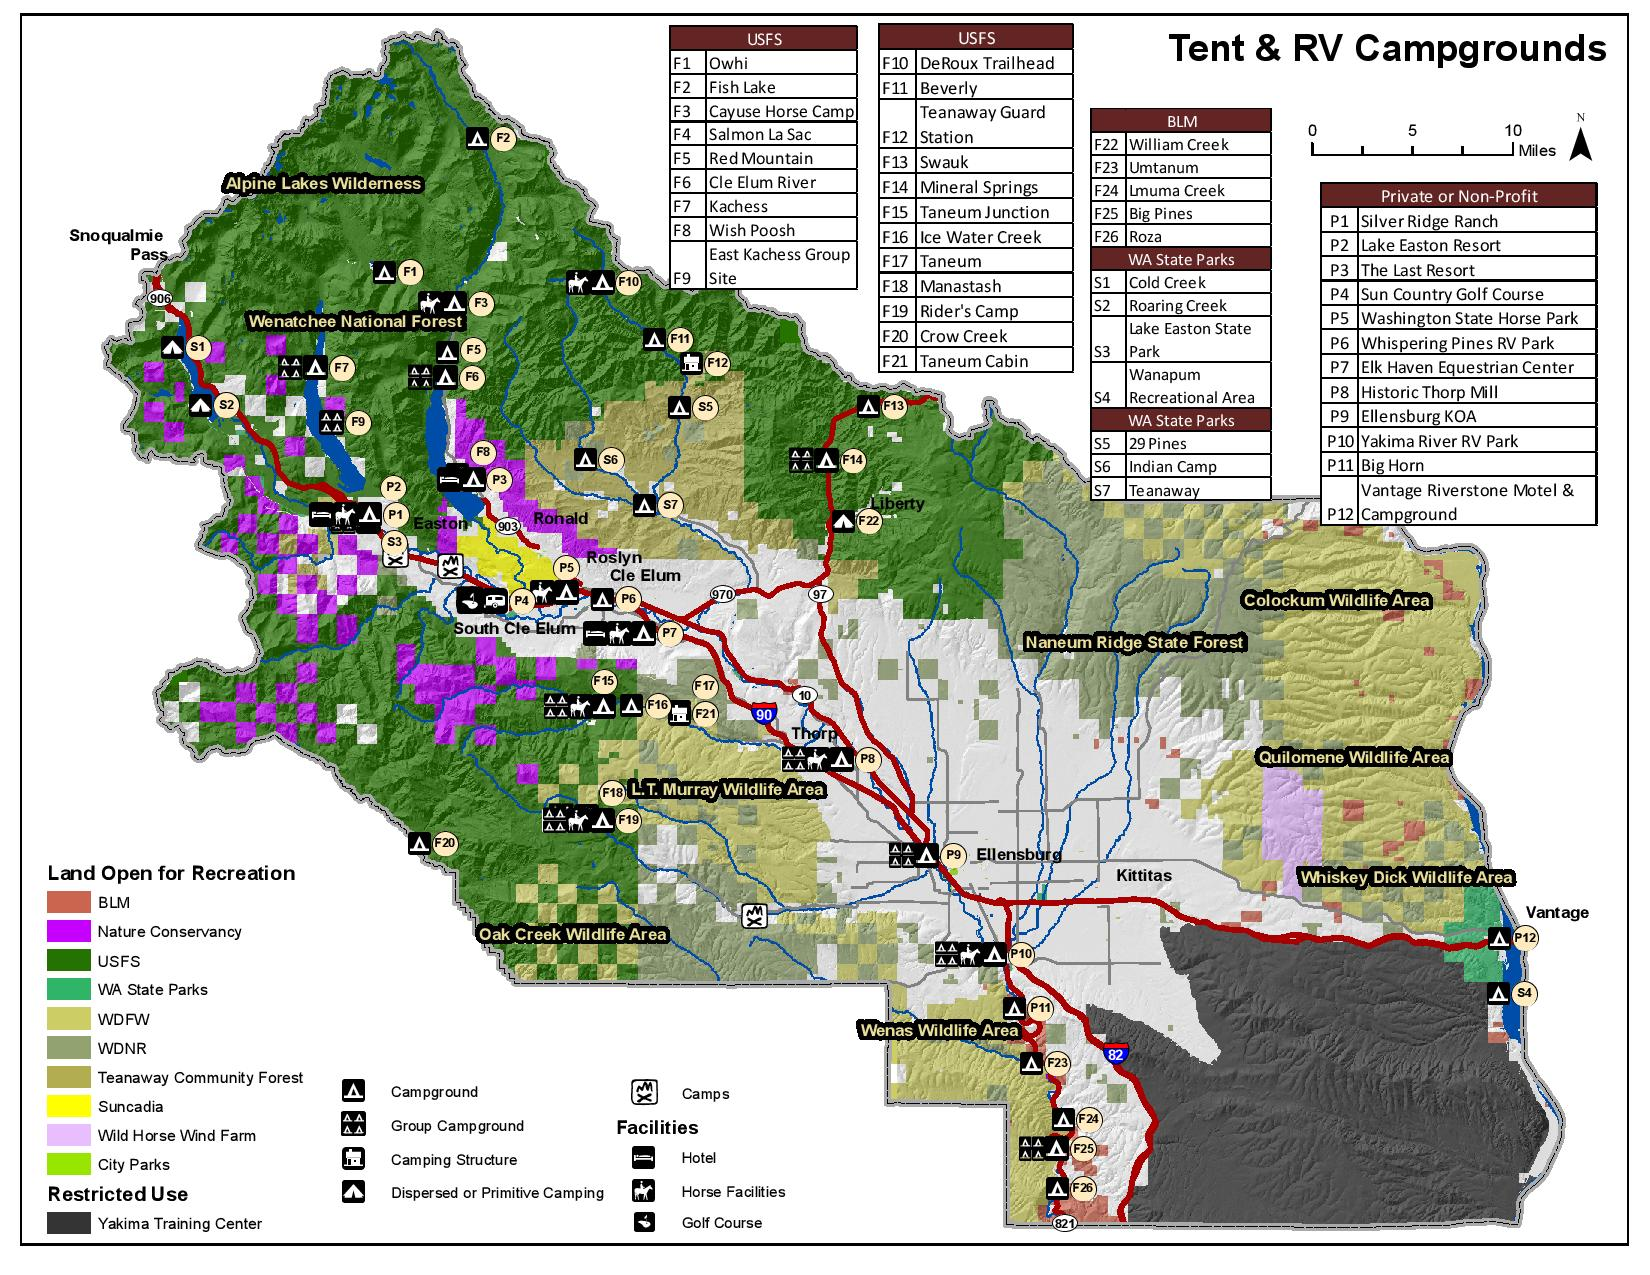 Kittitas County Tourism Study Campgrounds.jpg